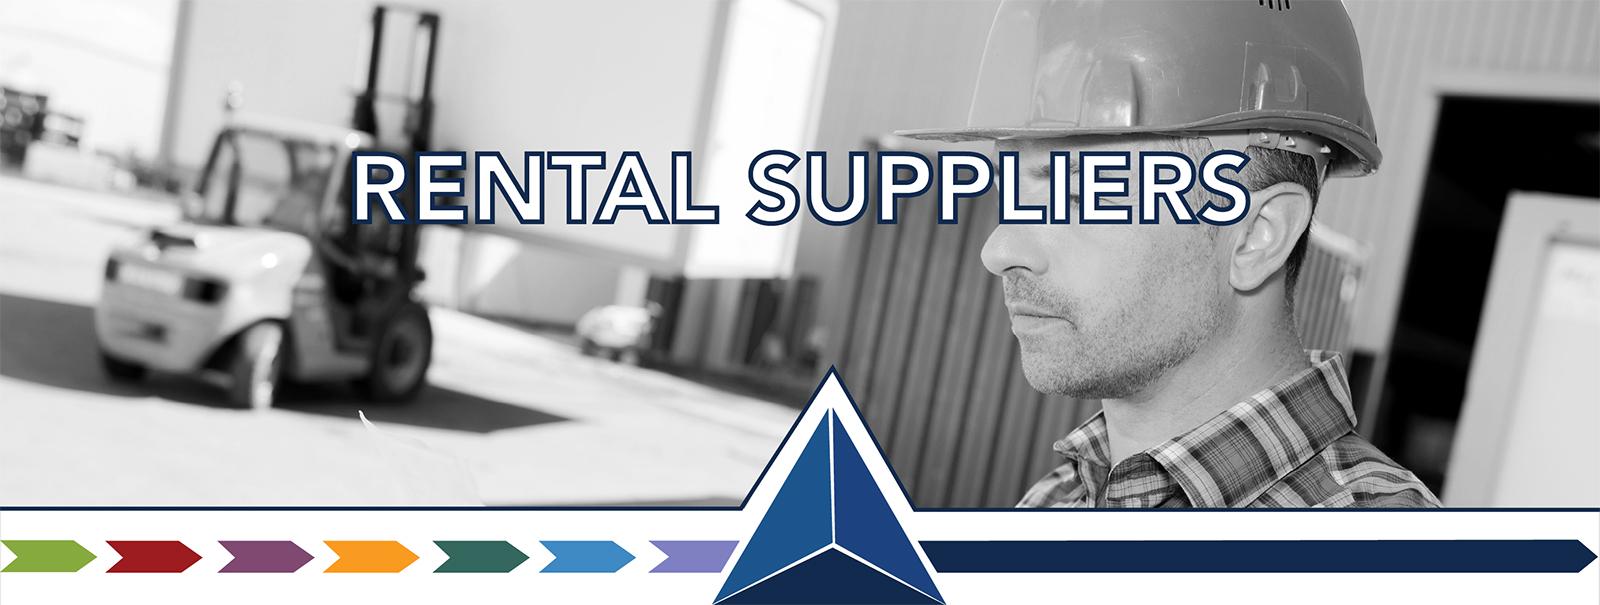 Rental Suppliers ERP Solution